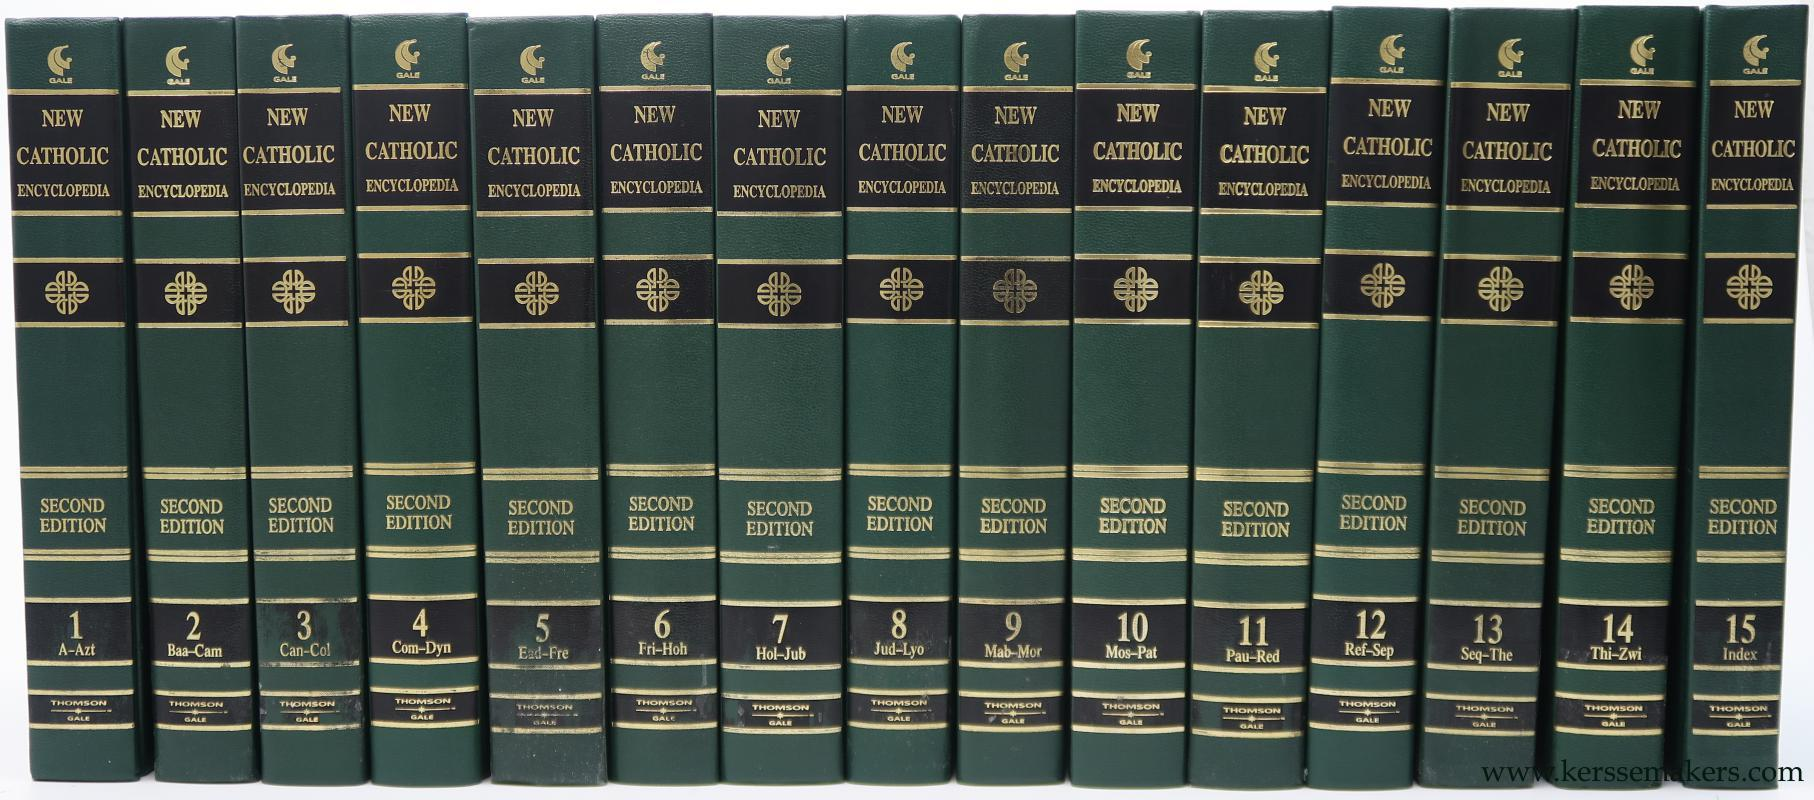 viaLibri ~ The New Catholic Encyclopedia ea31c2b0a1